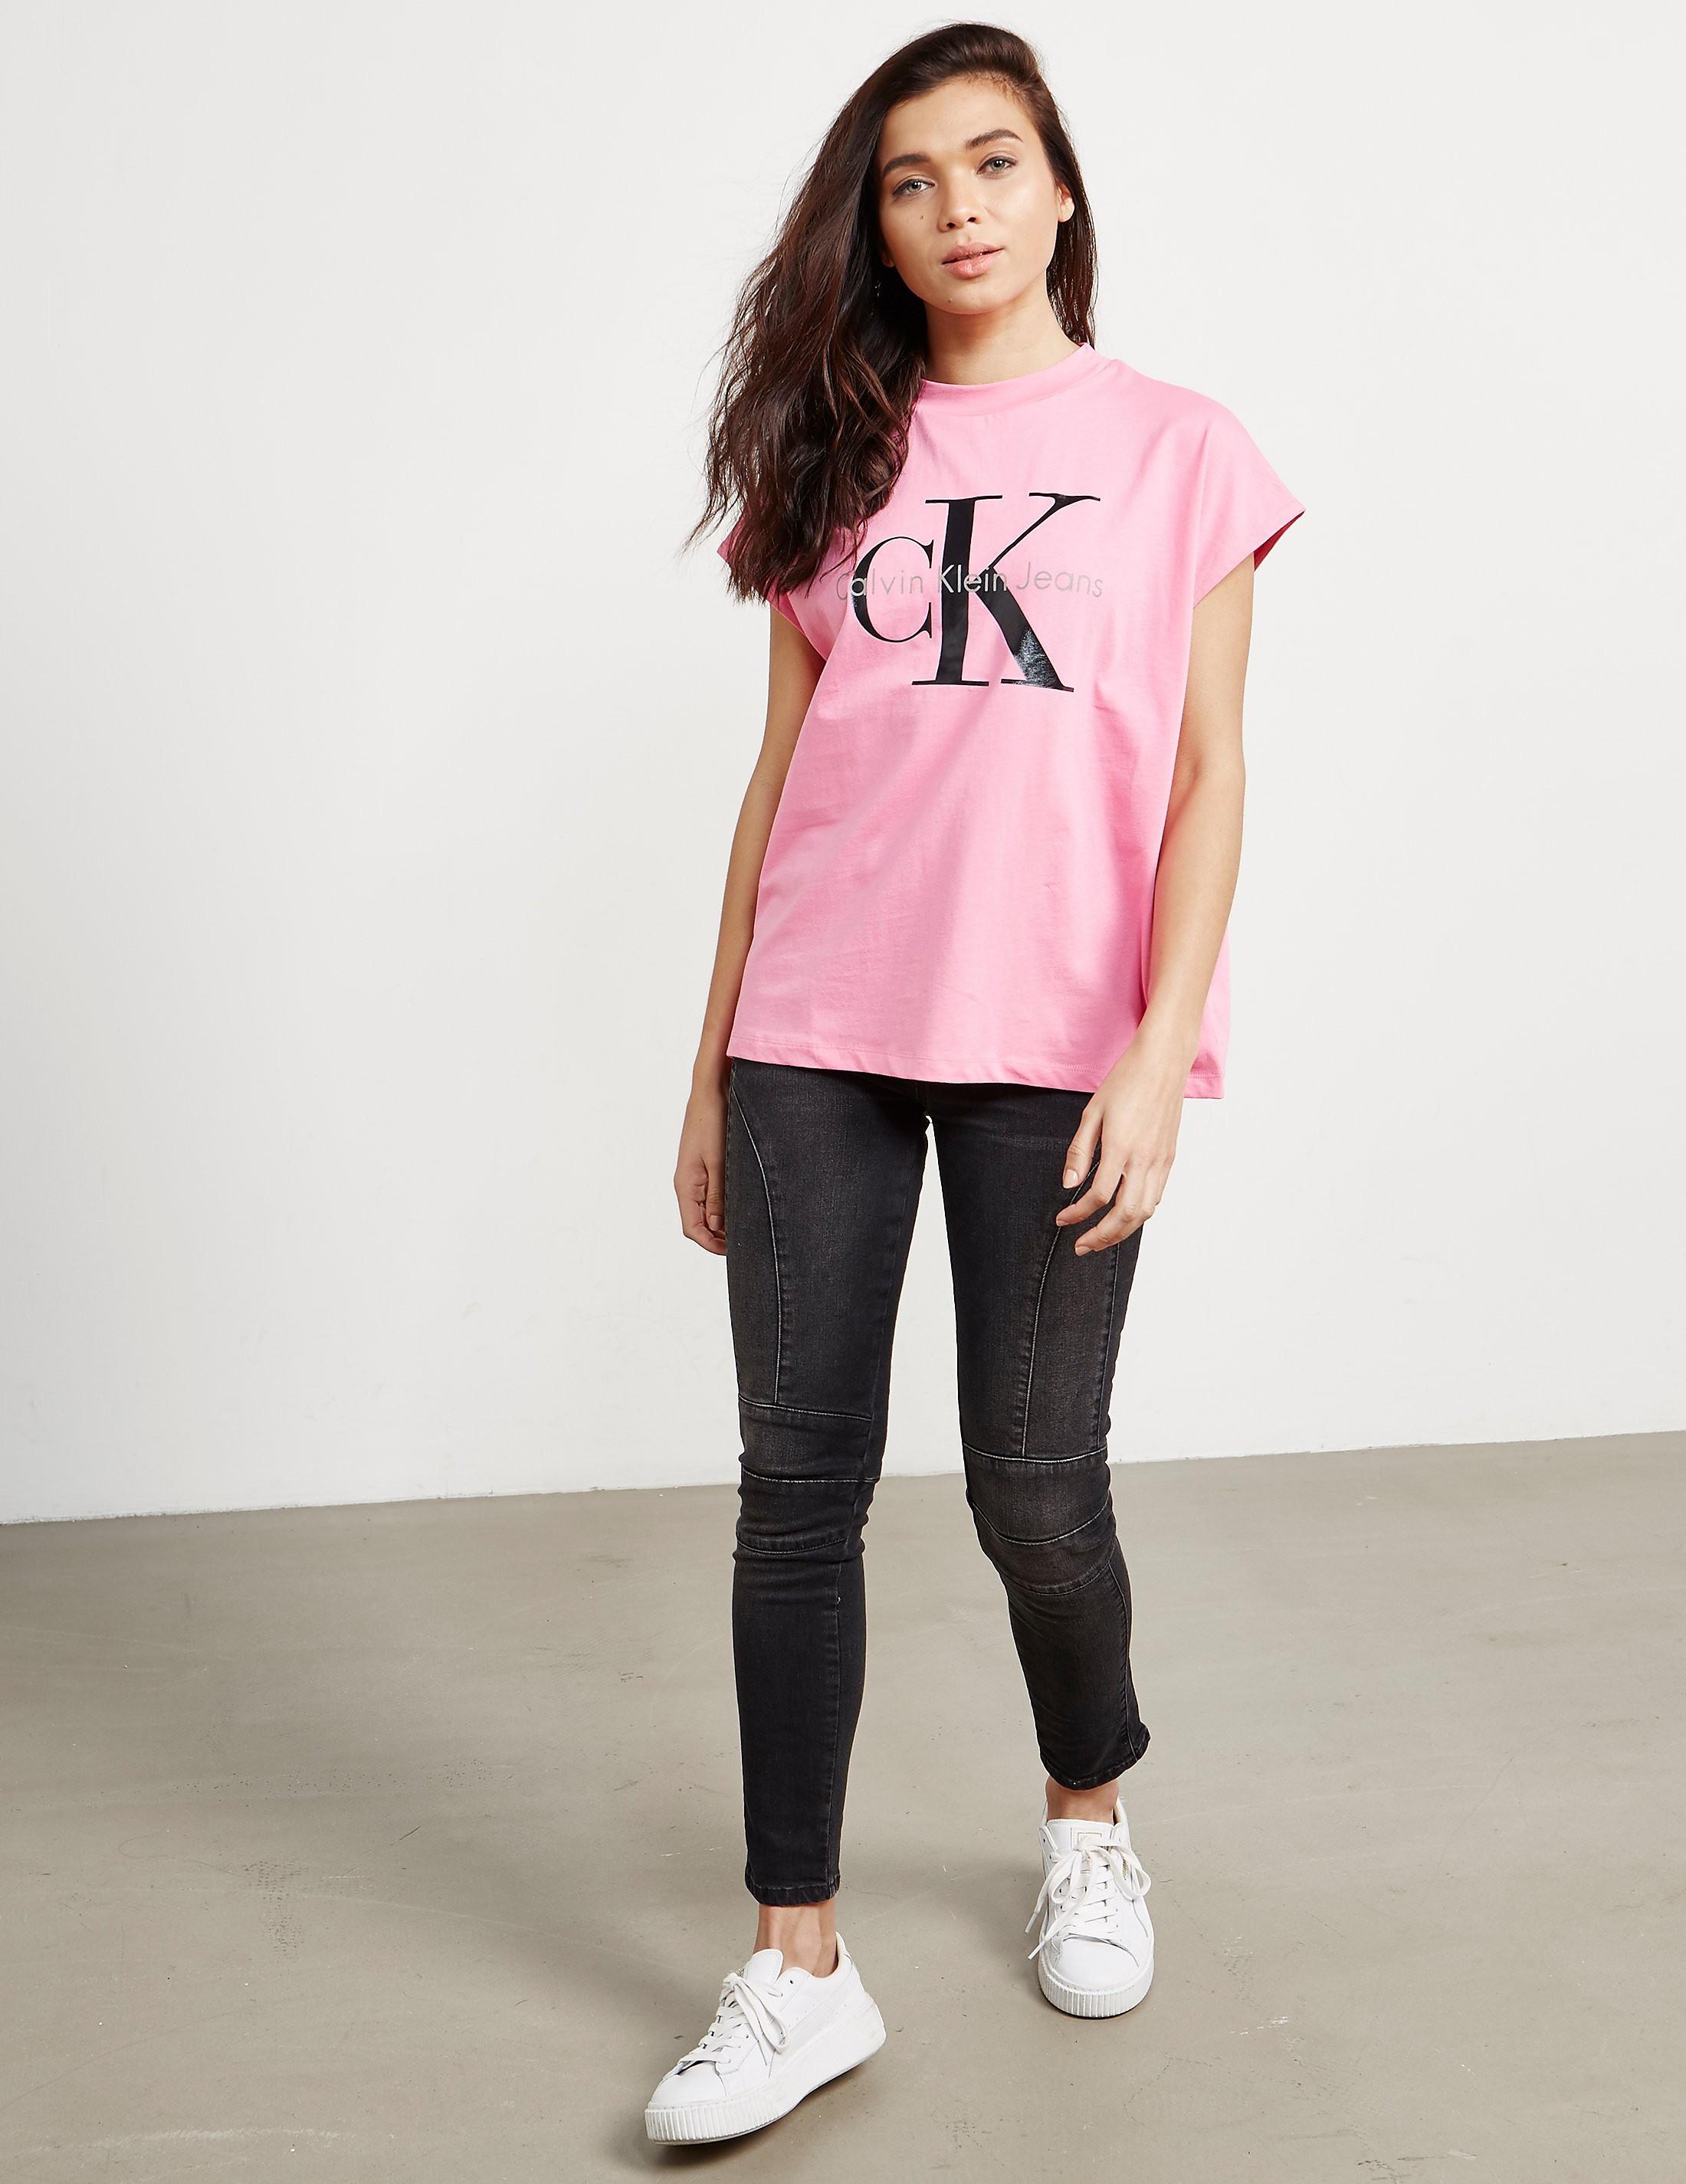 Calvin Klein Taka-5 Short Sleeve T-Shirt